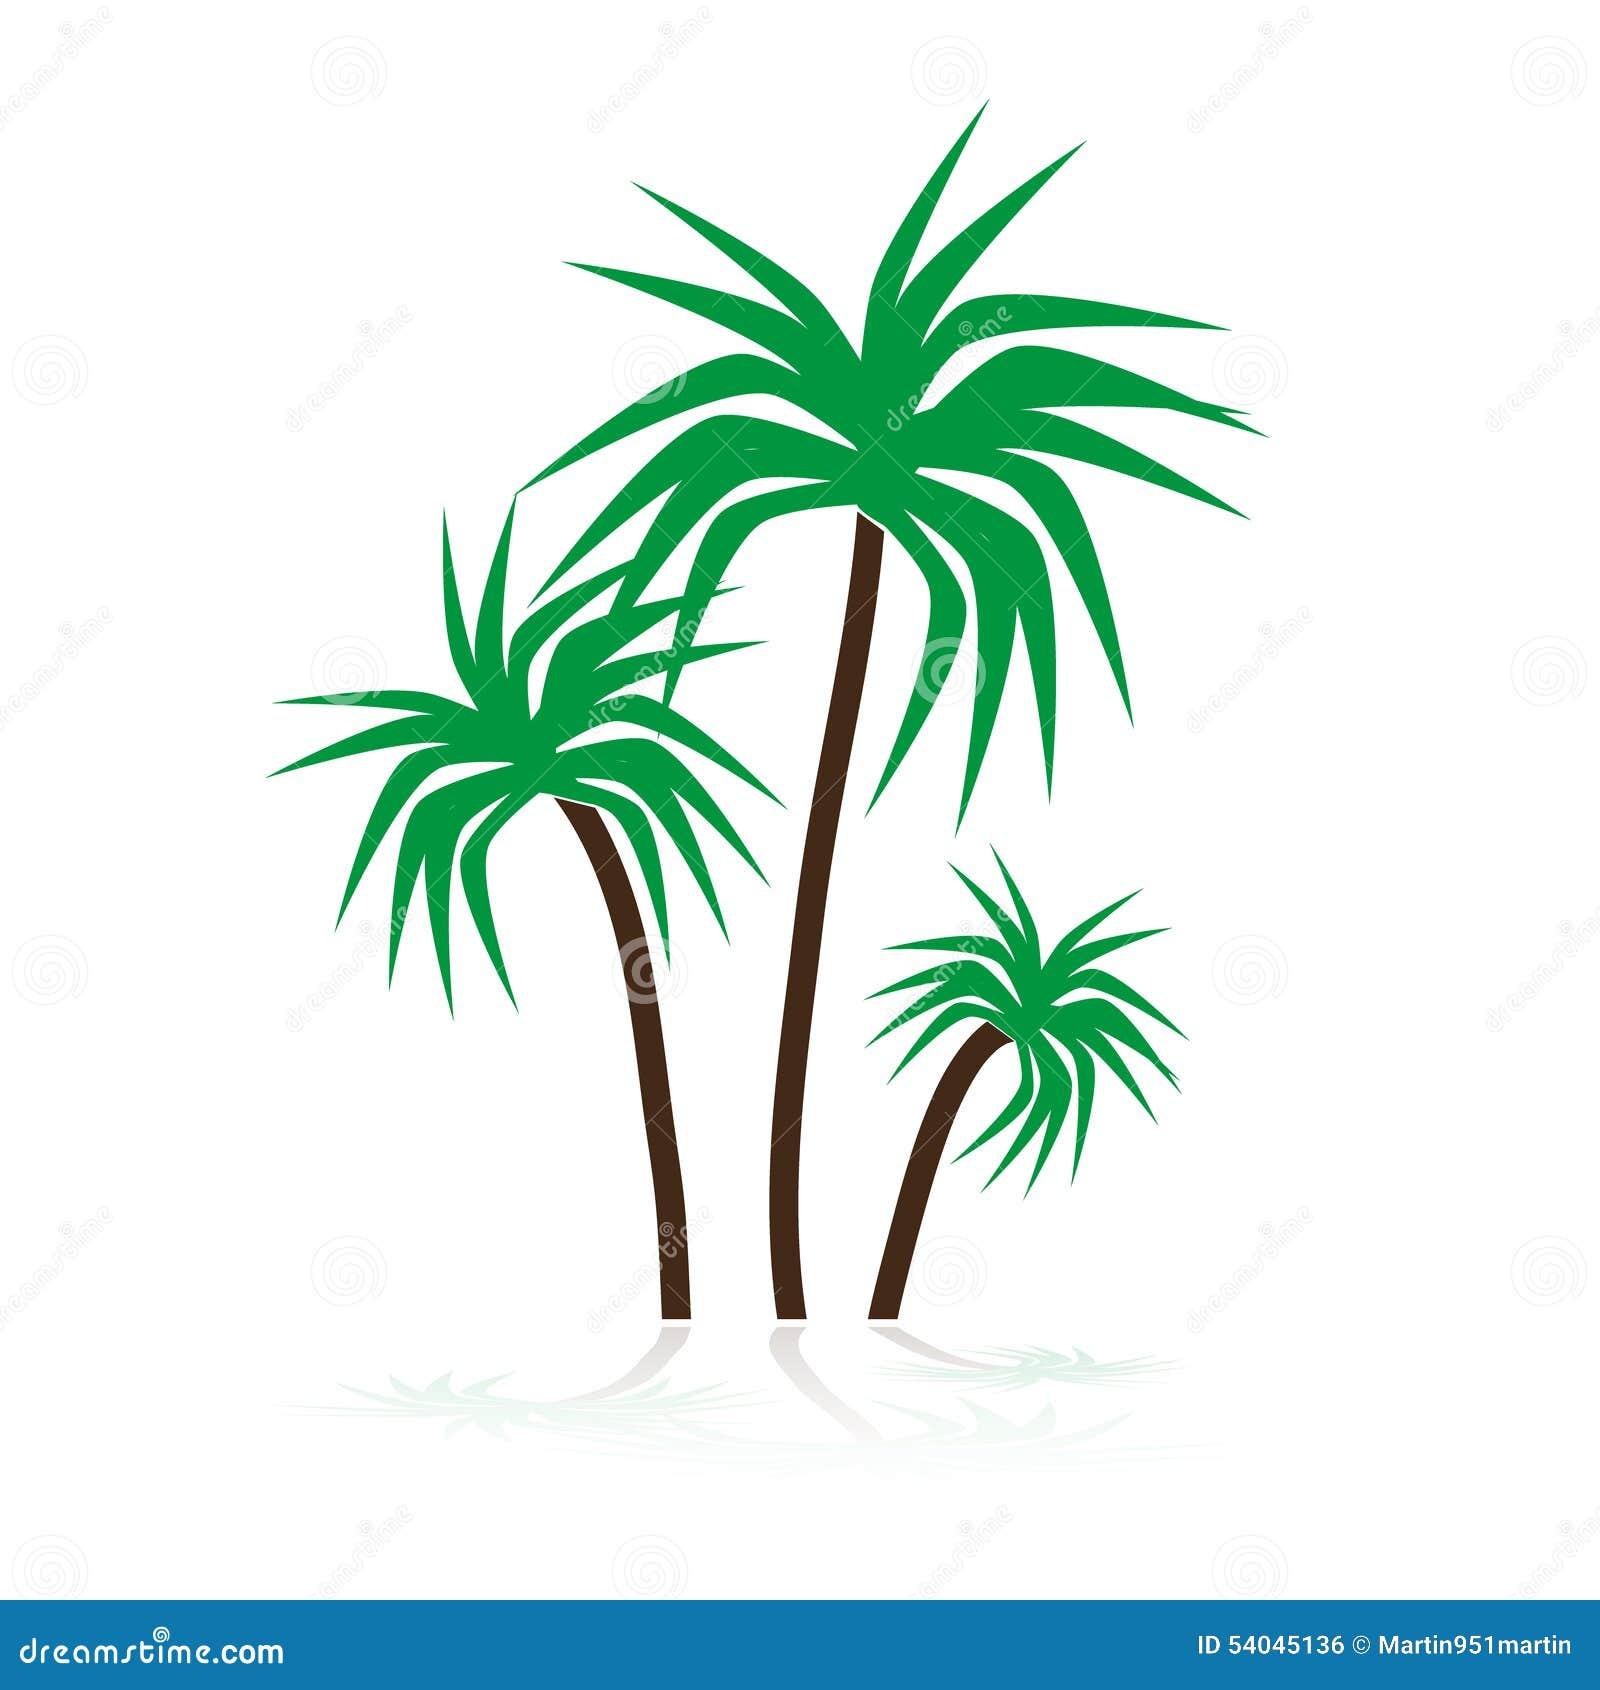 Simple Tropical Green Palm Trees Symbols Eps10 Illustration 54045136